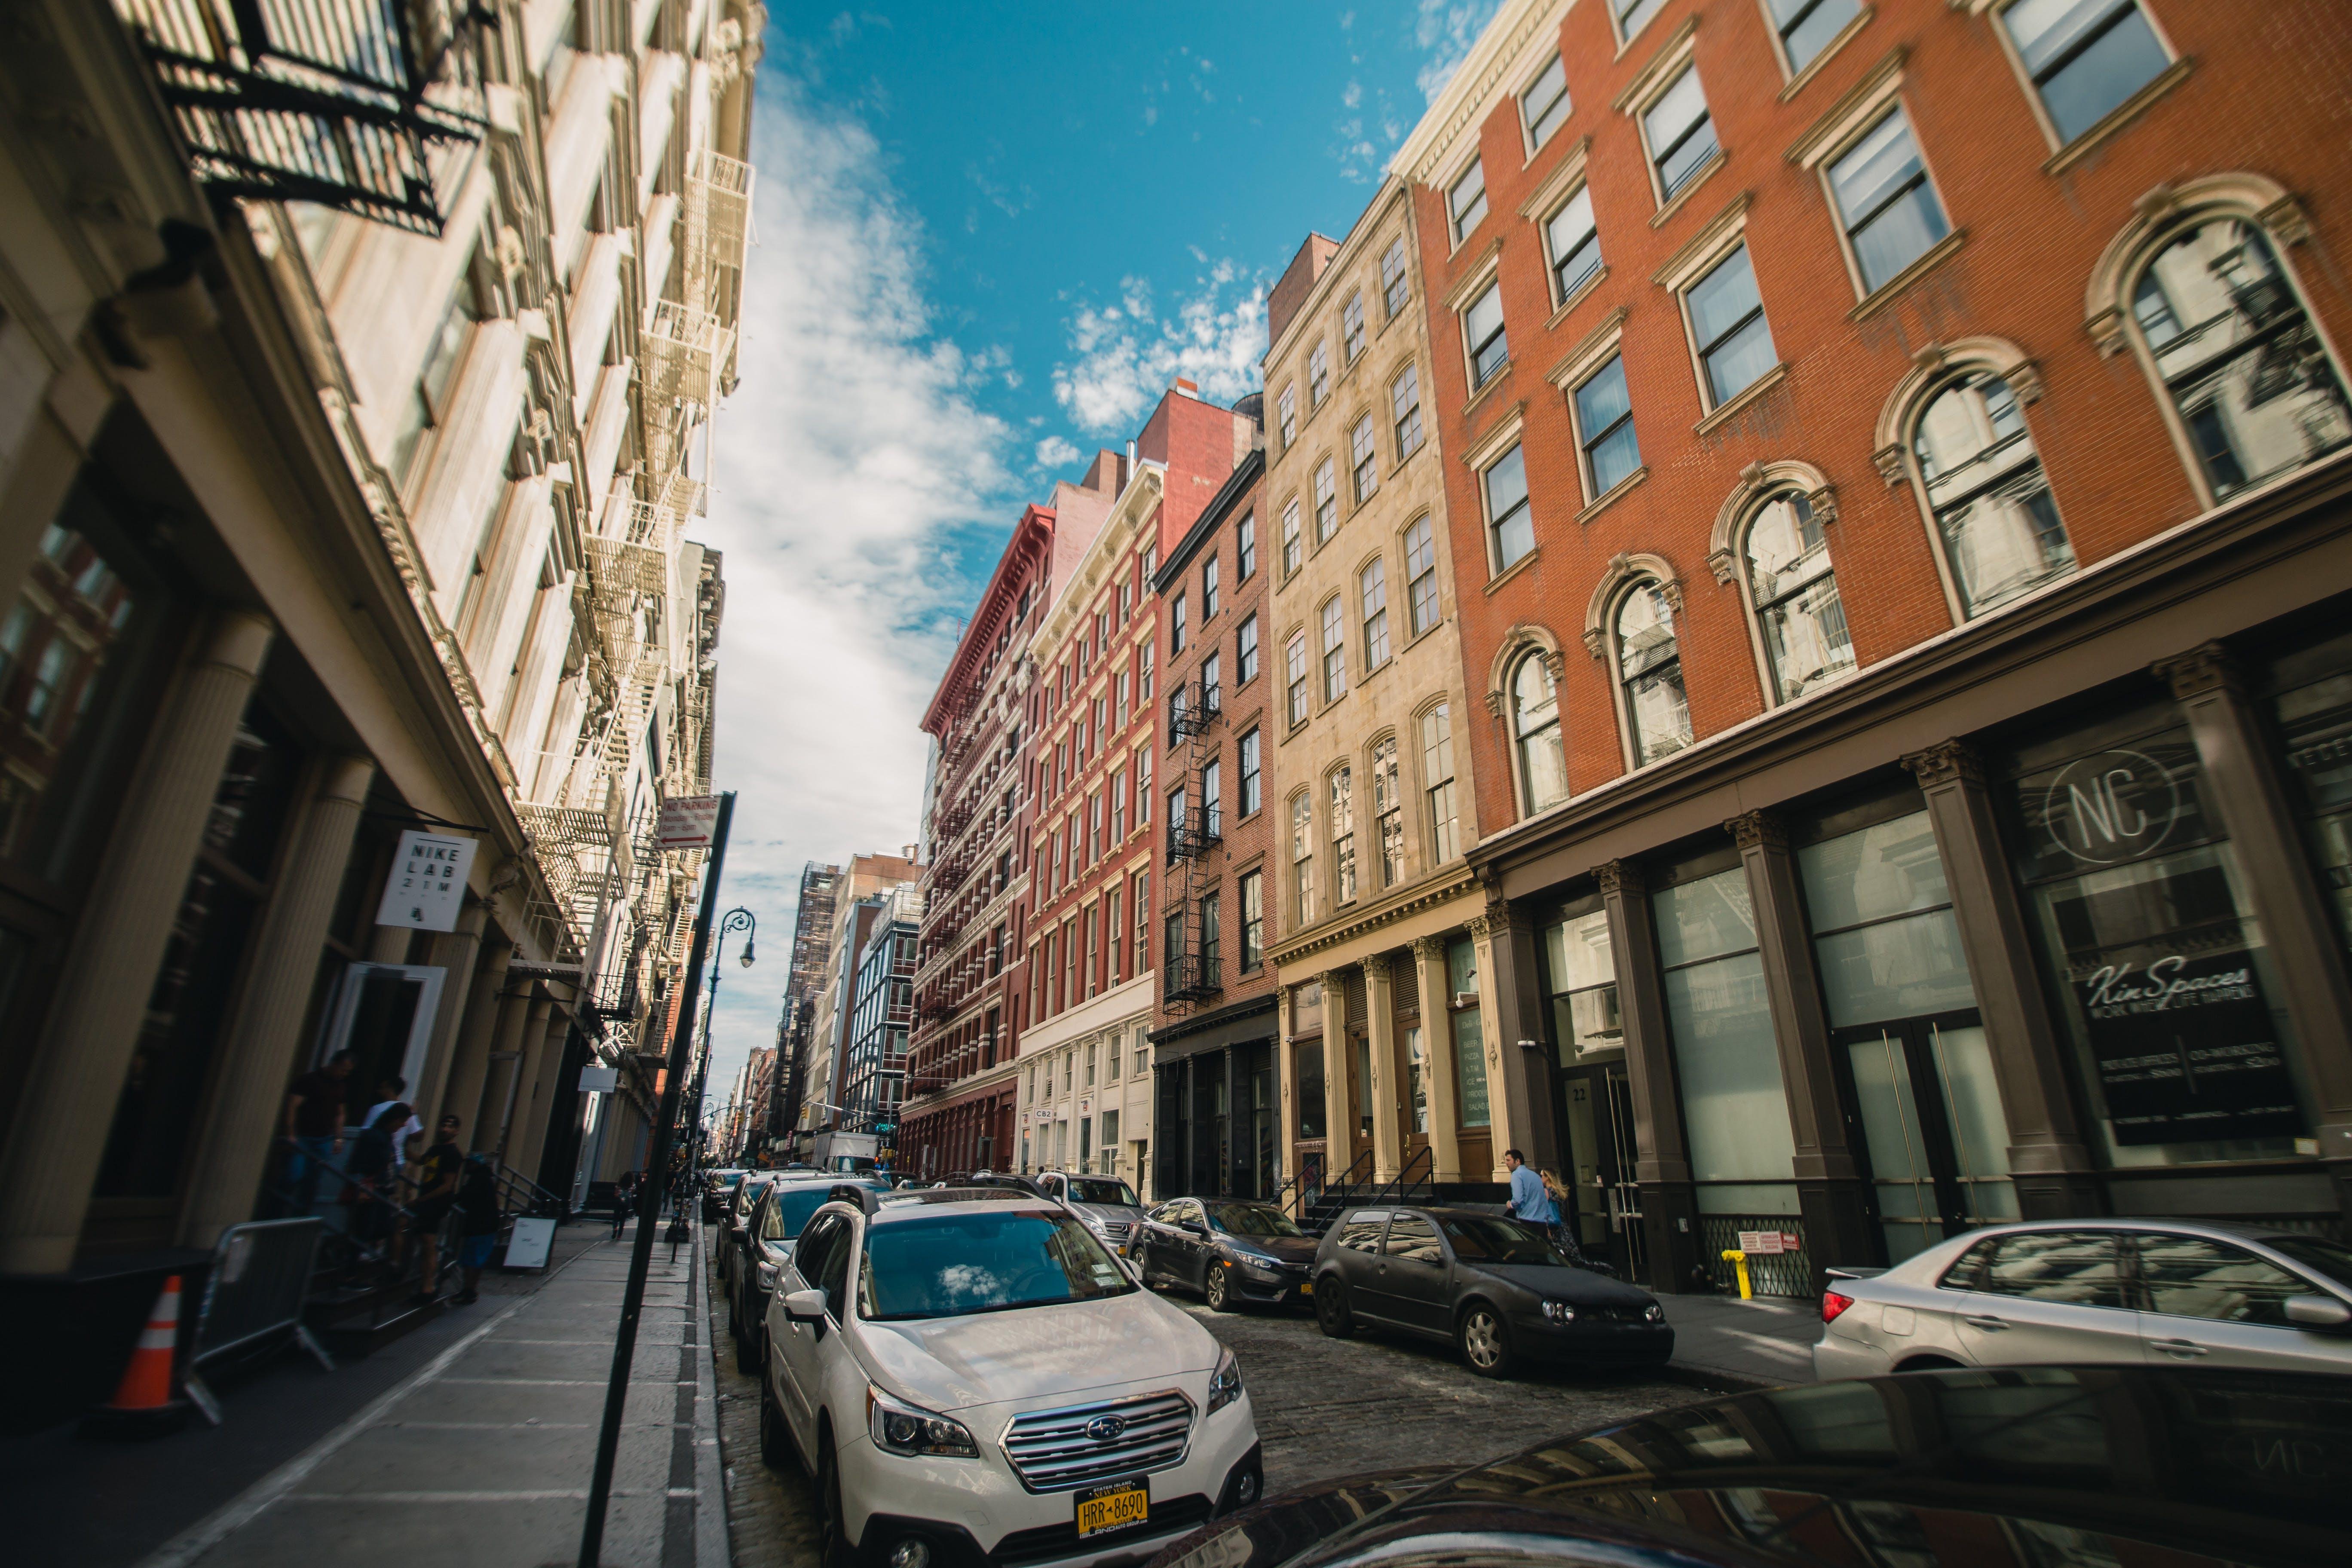 architektur, asphalt, autos